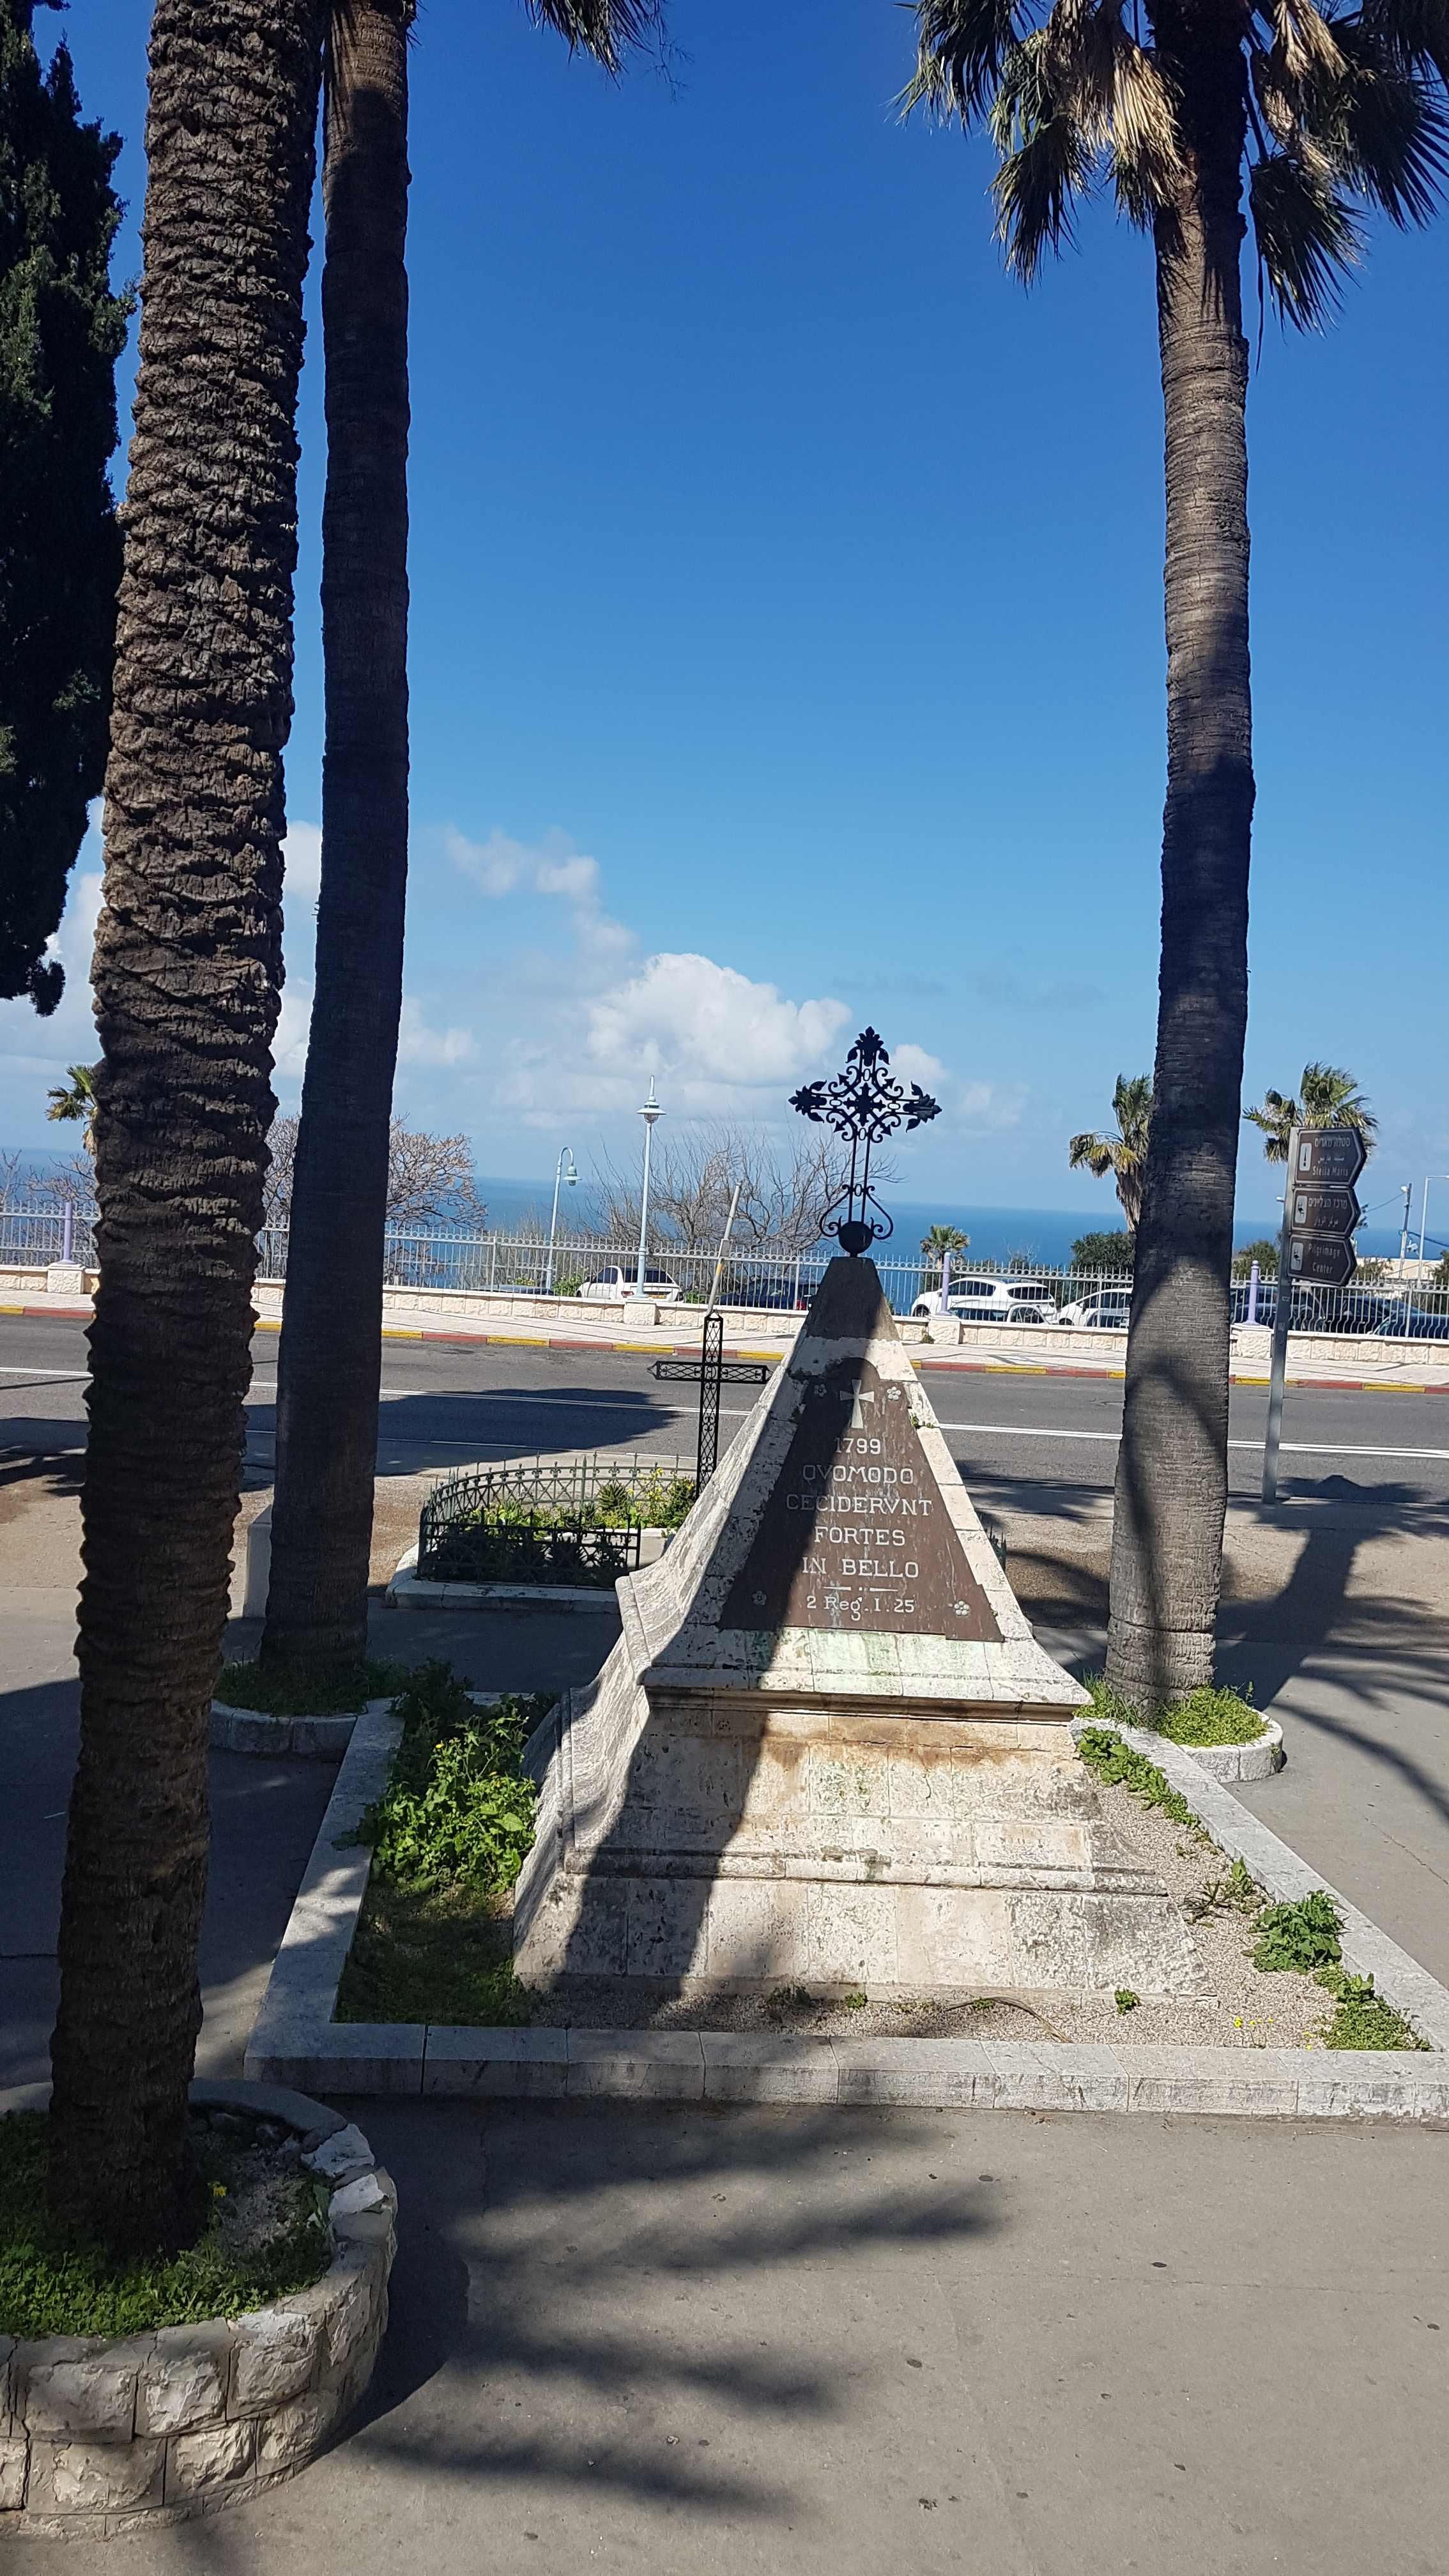 Wegen Corona nicht am Jordan entlang, sondern über Haifa.